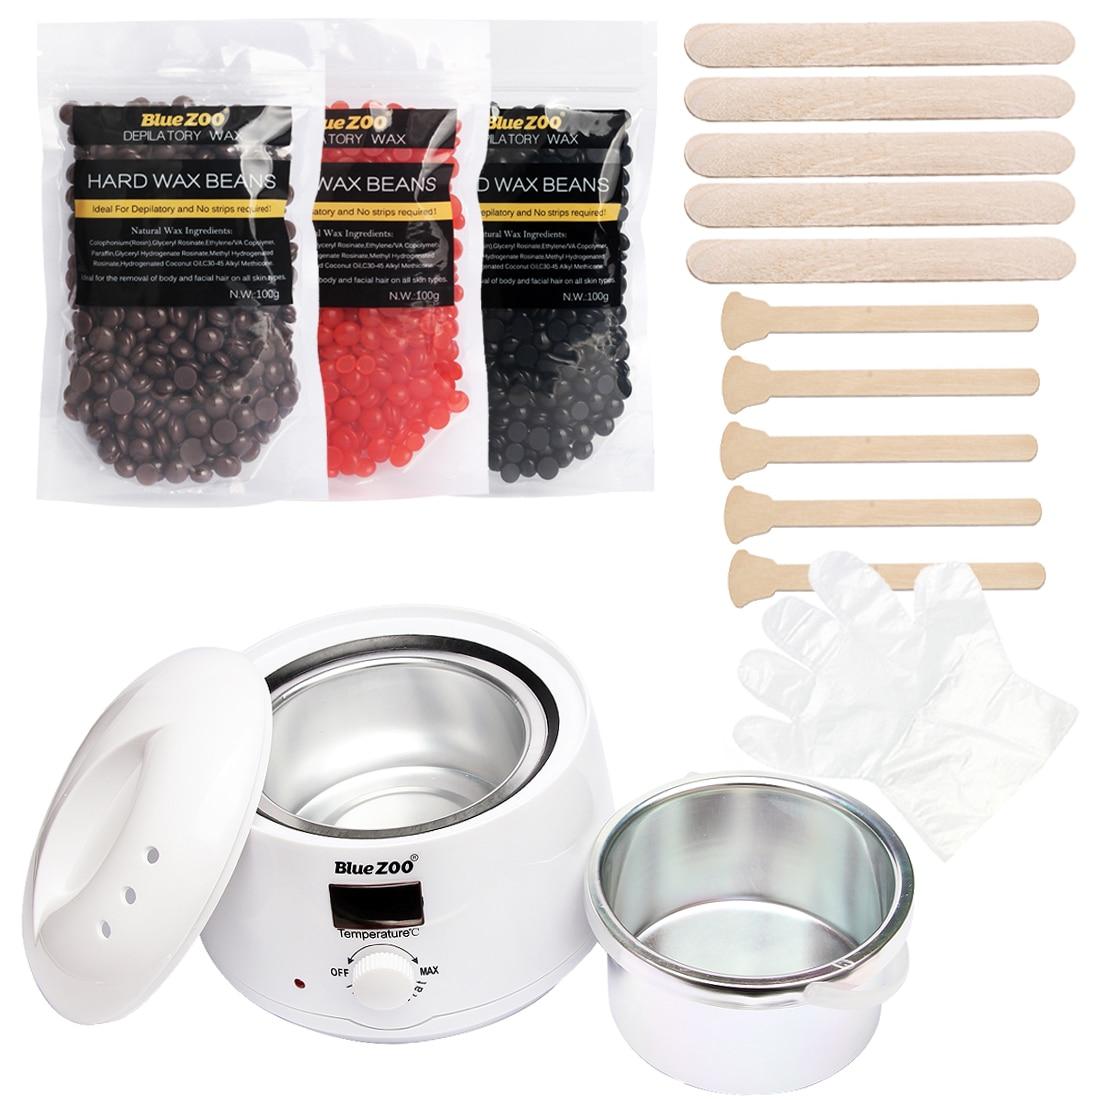 No Strips Hair Removal Wax Heater Depilatory Wax Set Hot Wax Heater Machine + 3 Bag Wax Beans + 10 Wood Spatulas + 10 Gloves hecig wax